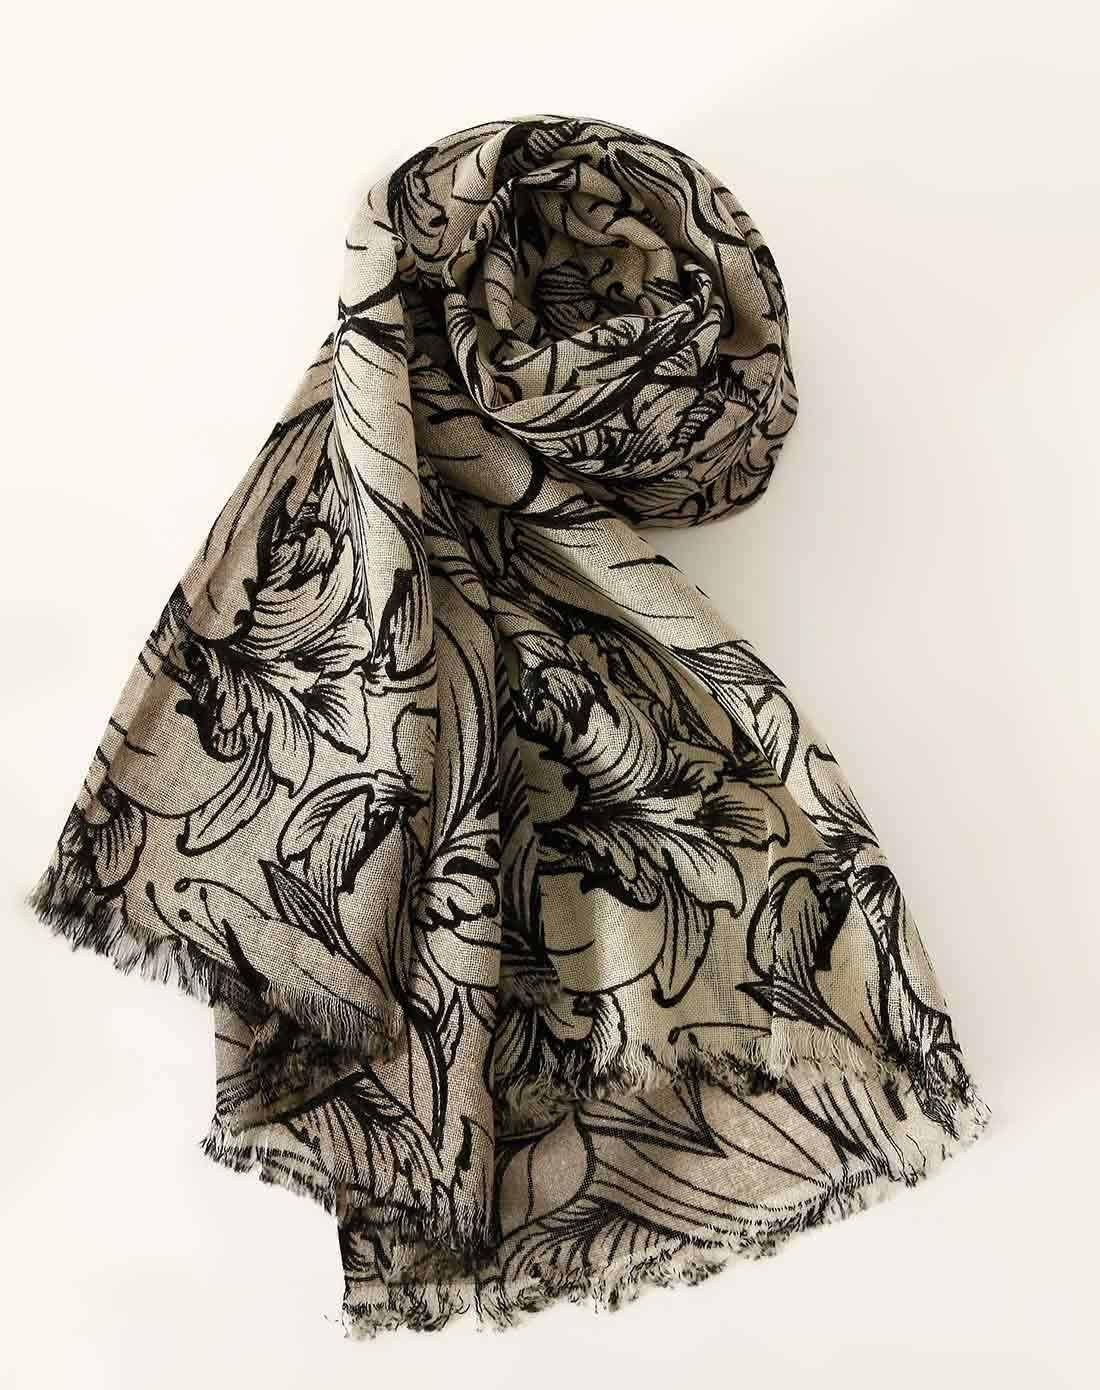 phillips围巾专场100%羊毛花朵树叶图案印花围巾